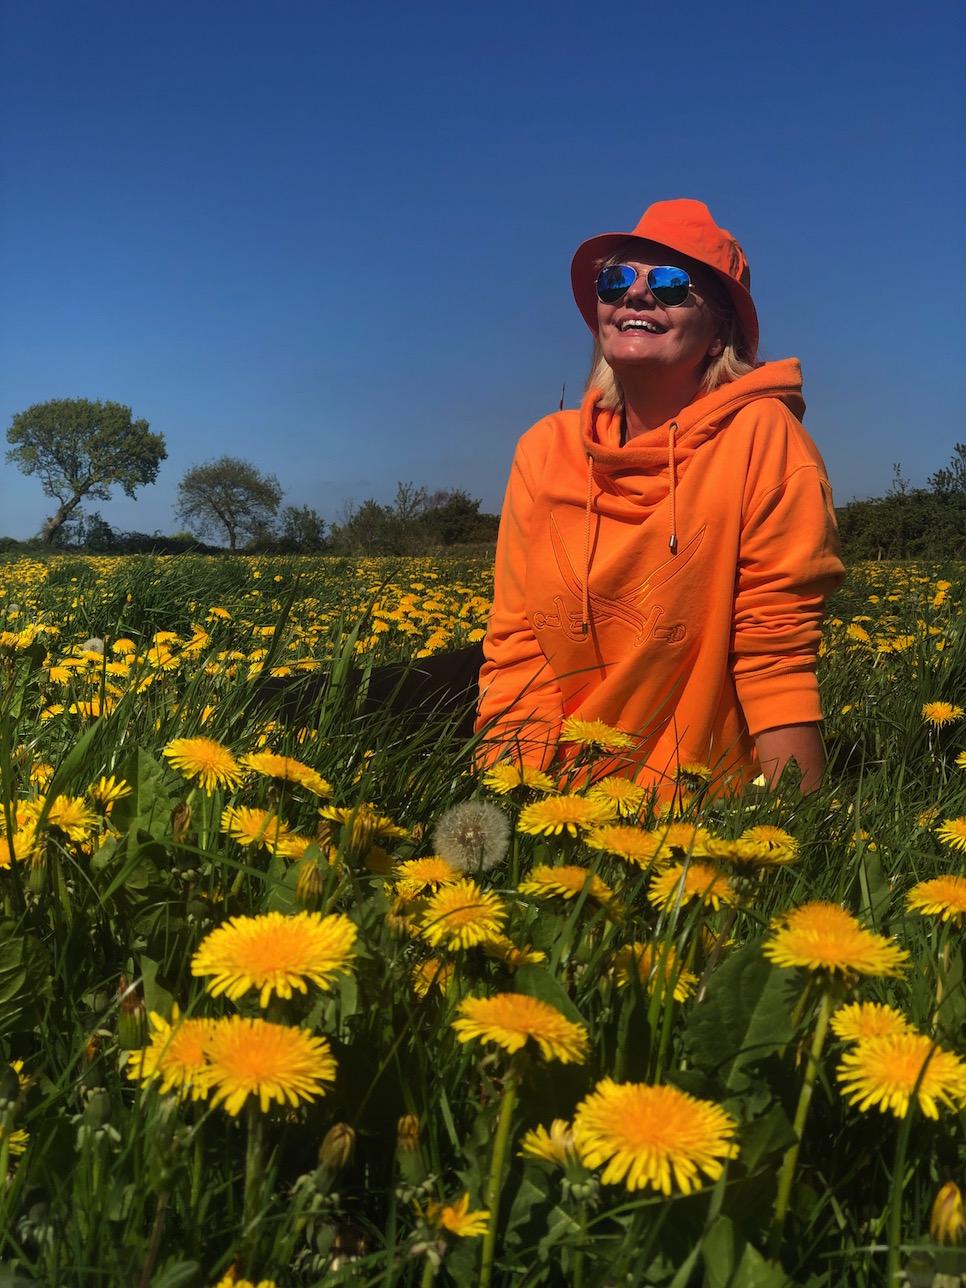 Frühlingsoutfit on orange auf gelber Blumenwiese